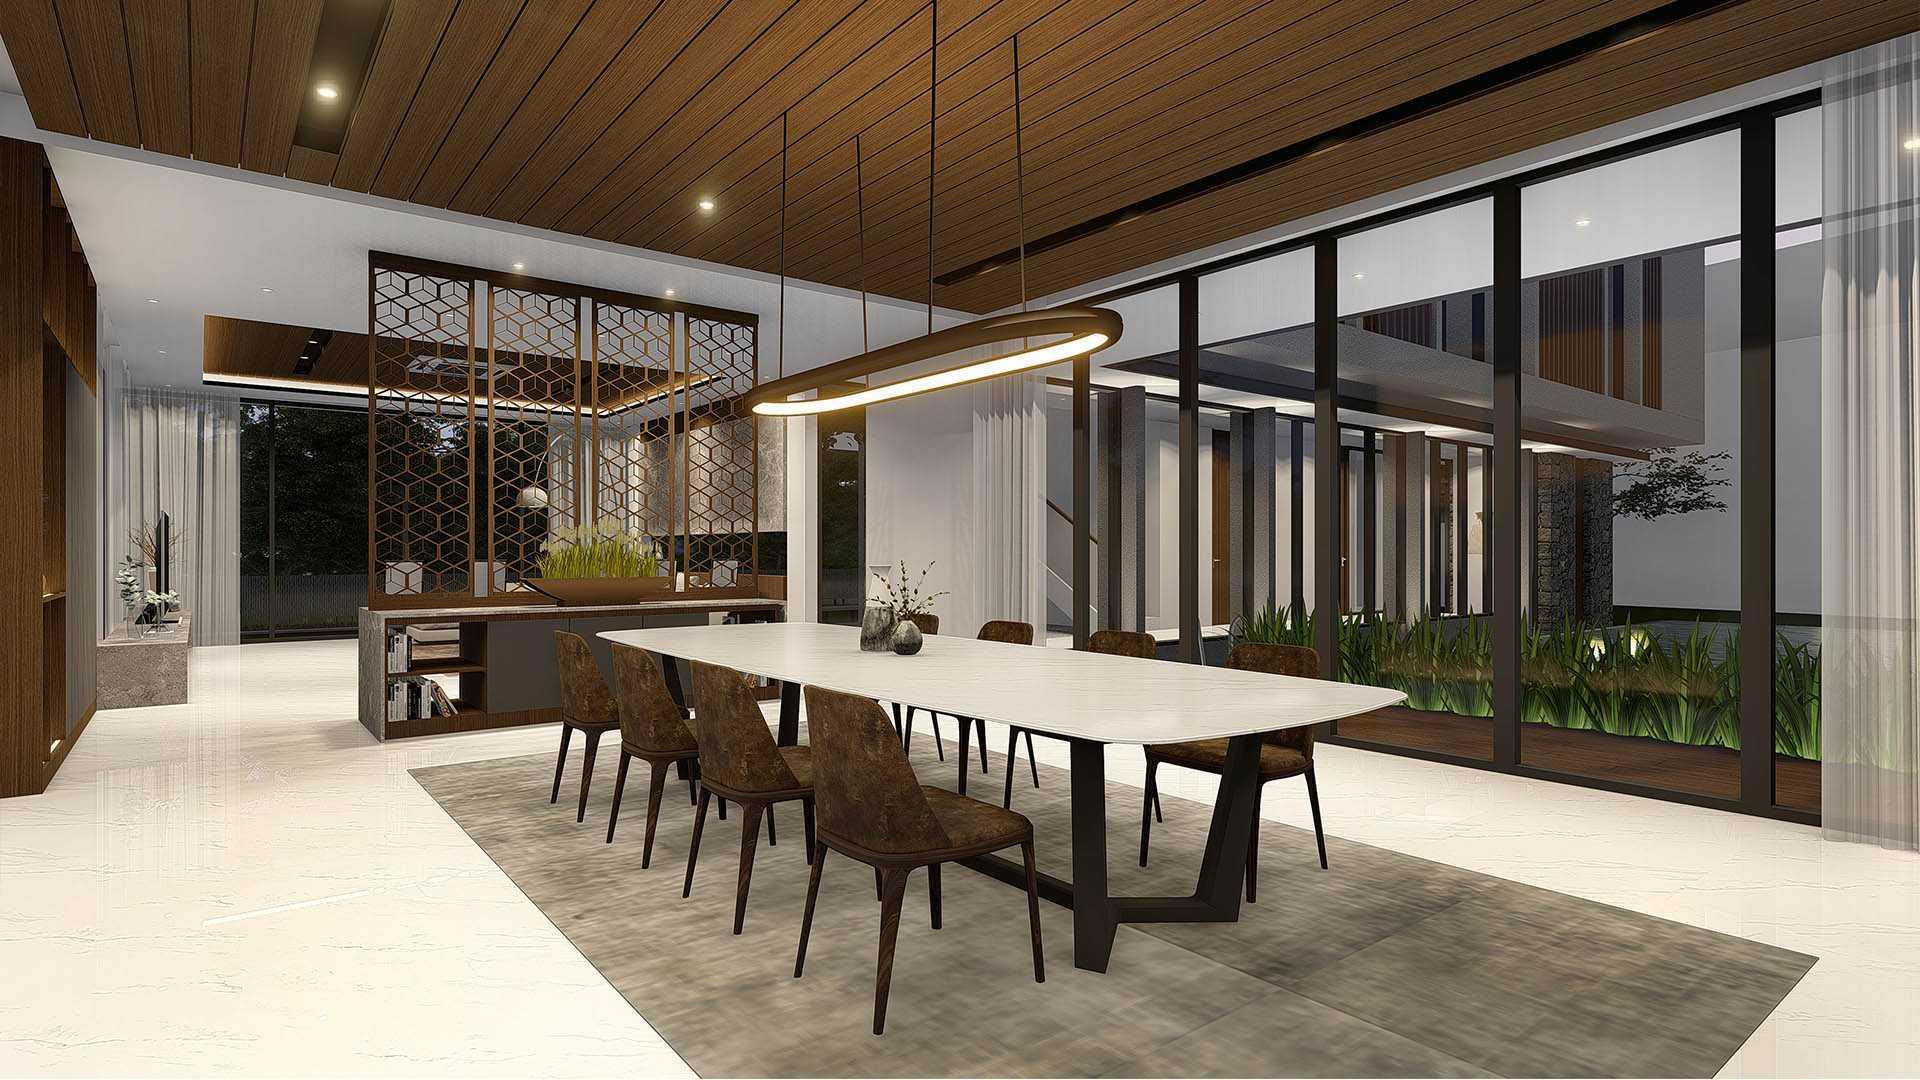 Co Associates J House Lampung, Indonesia Lampung, Indonesia Co-Associates-J-House   97023